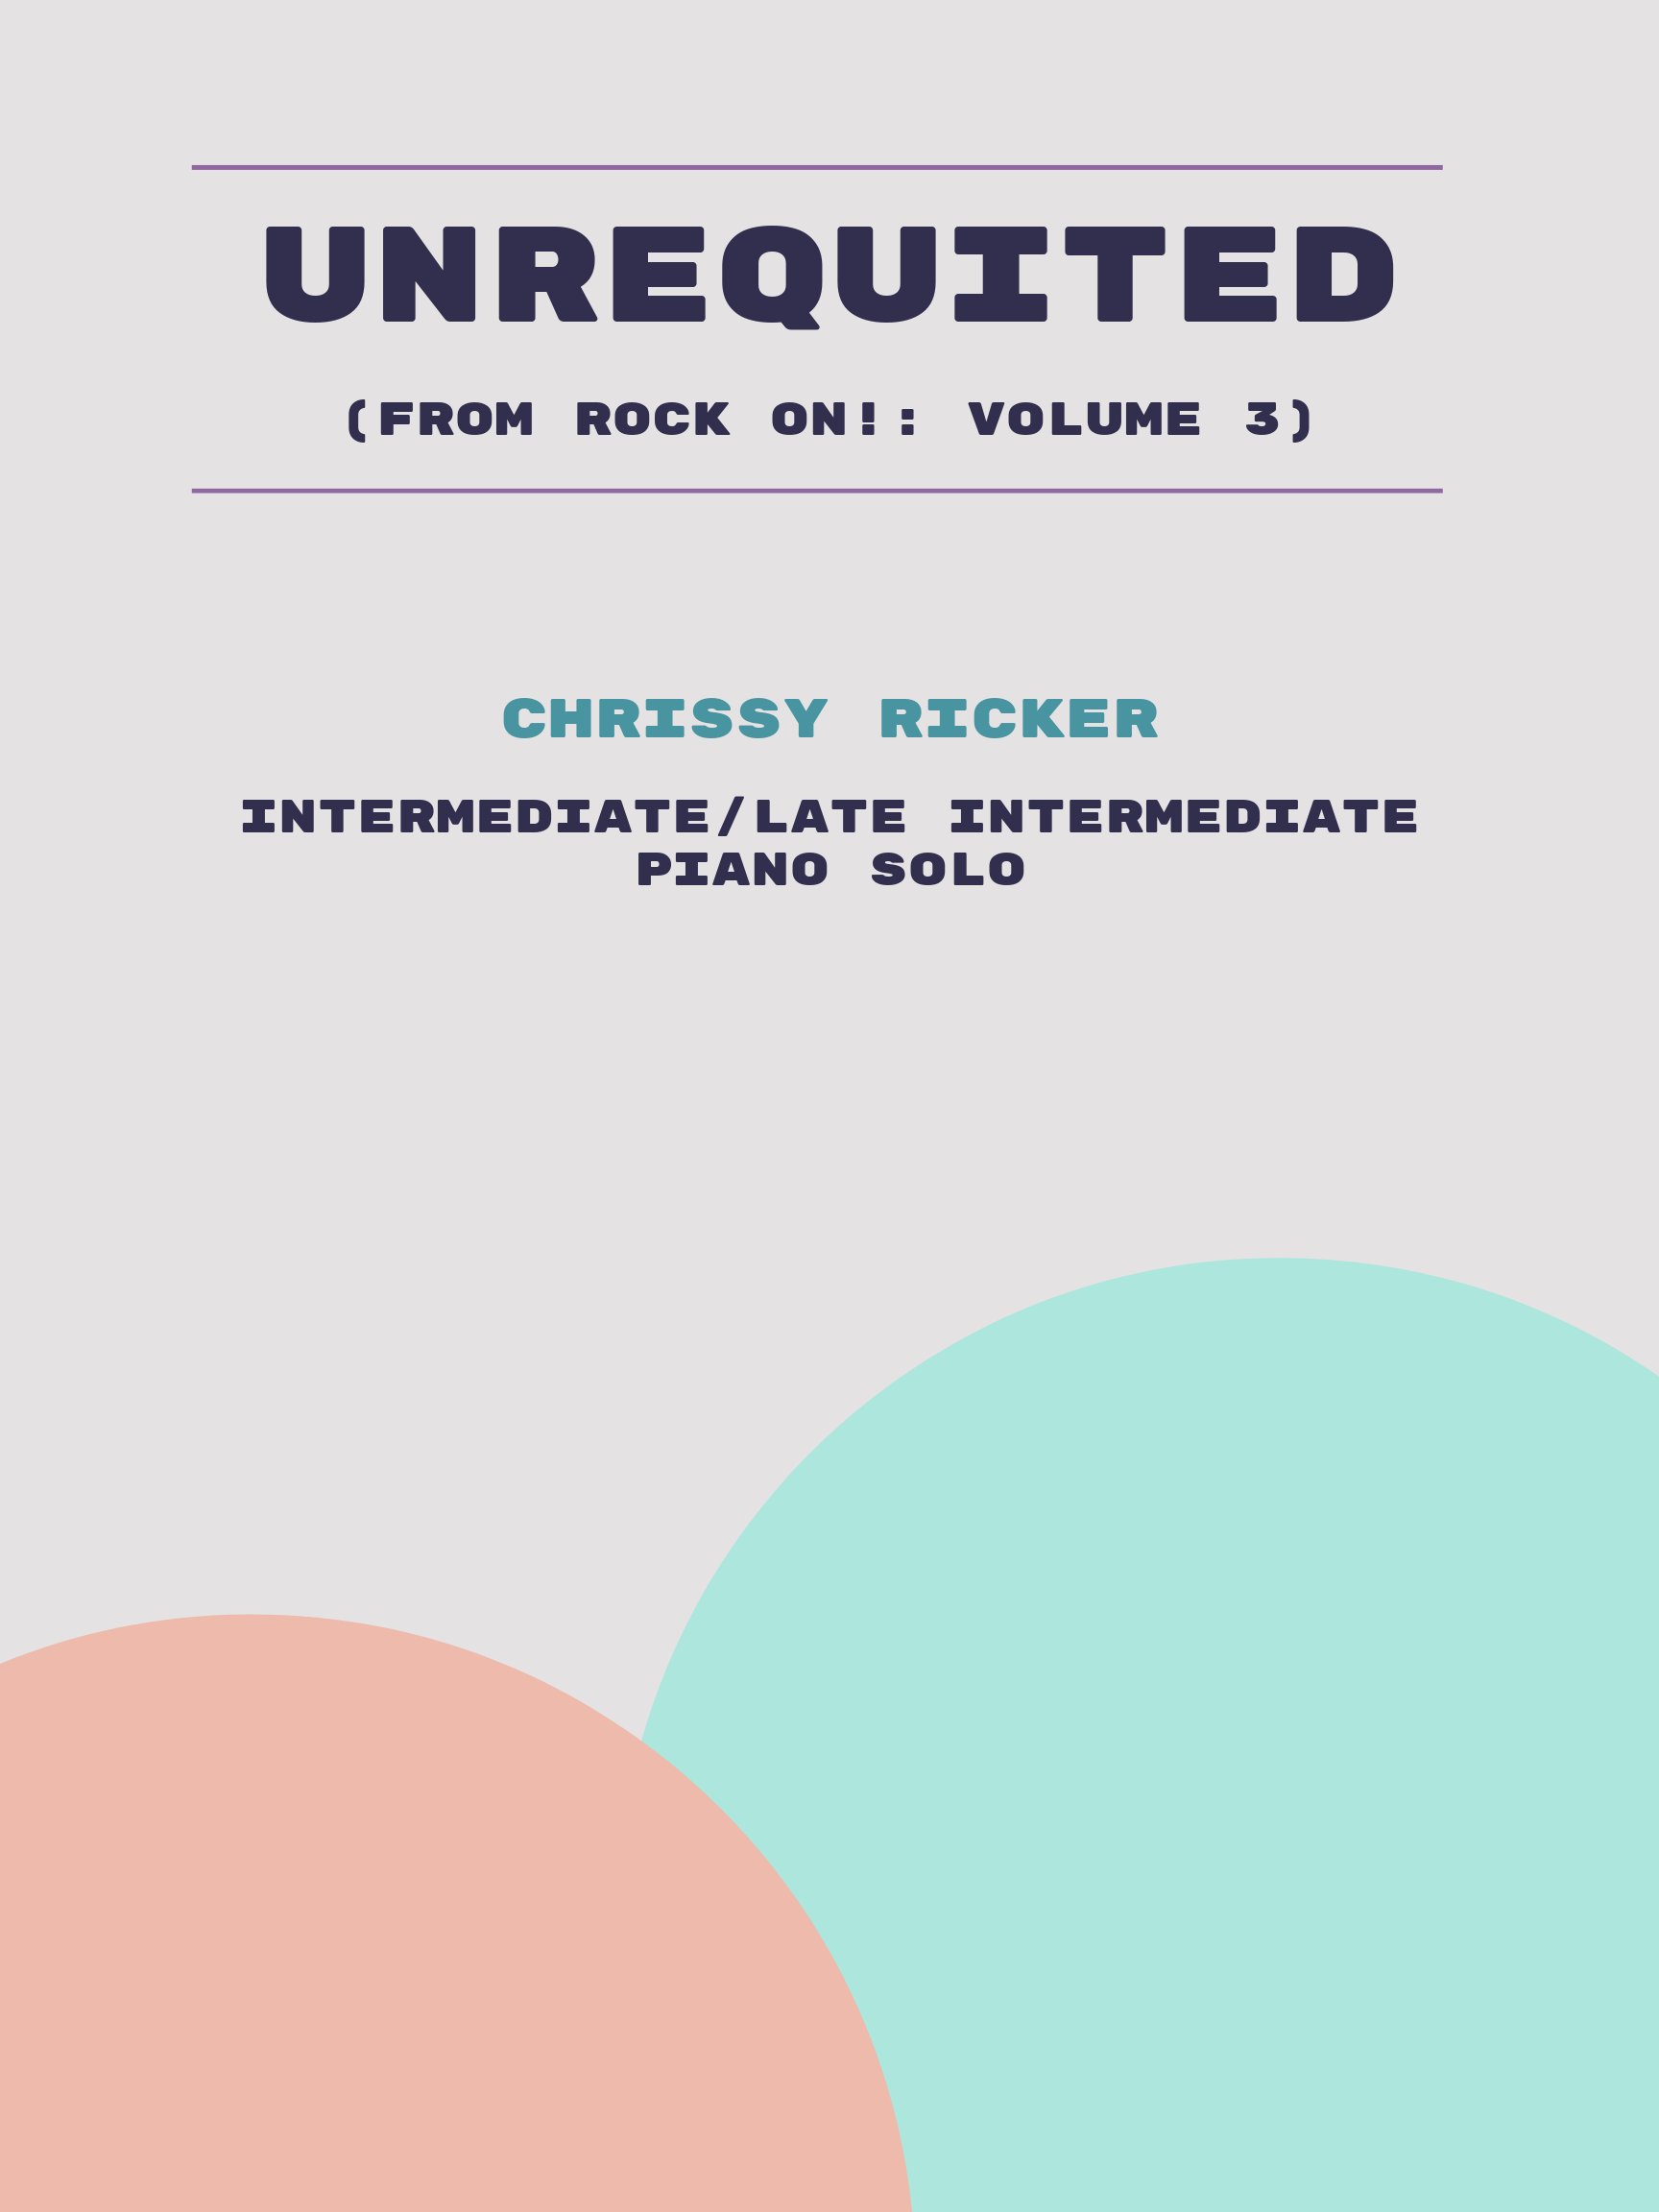 Unrequited by Chrissy Ricker